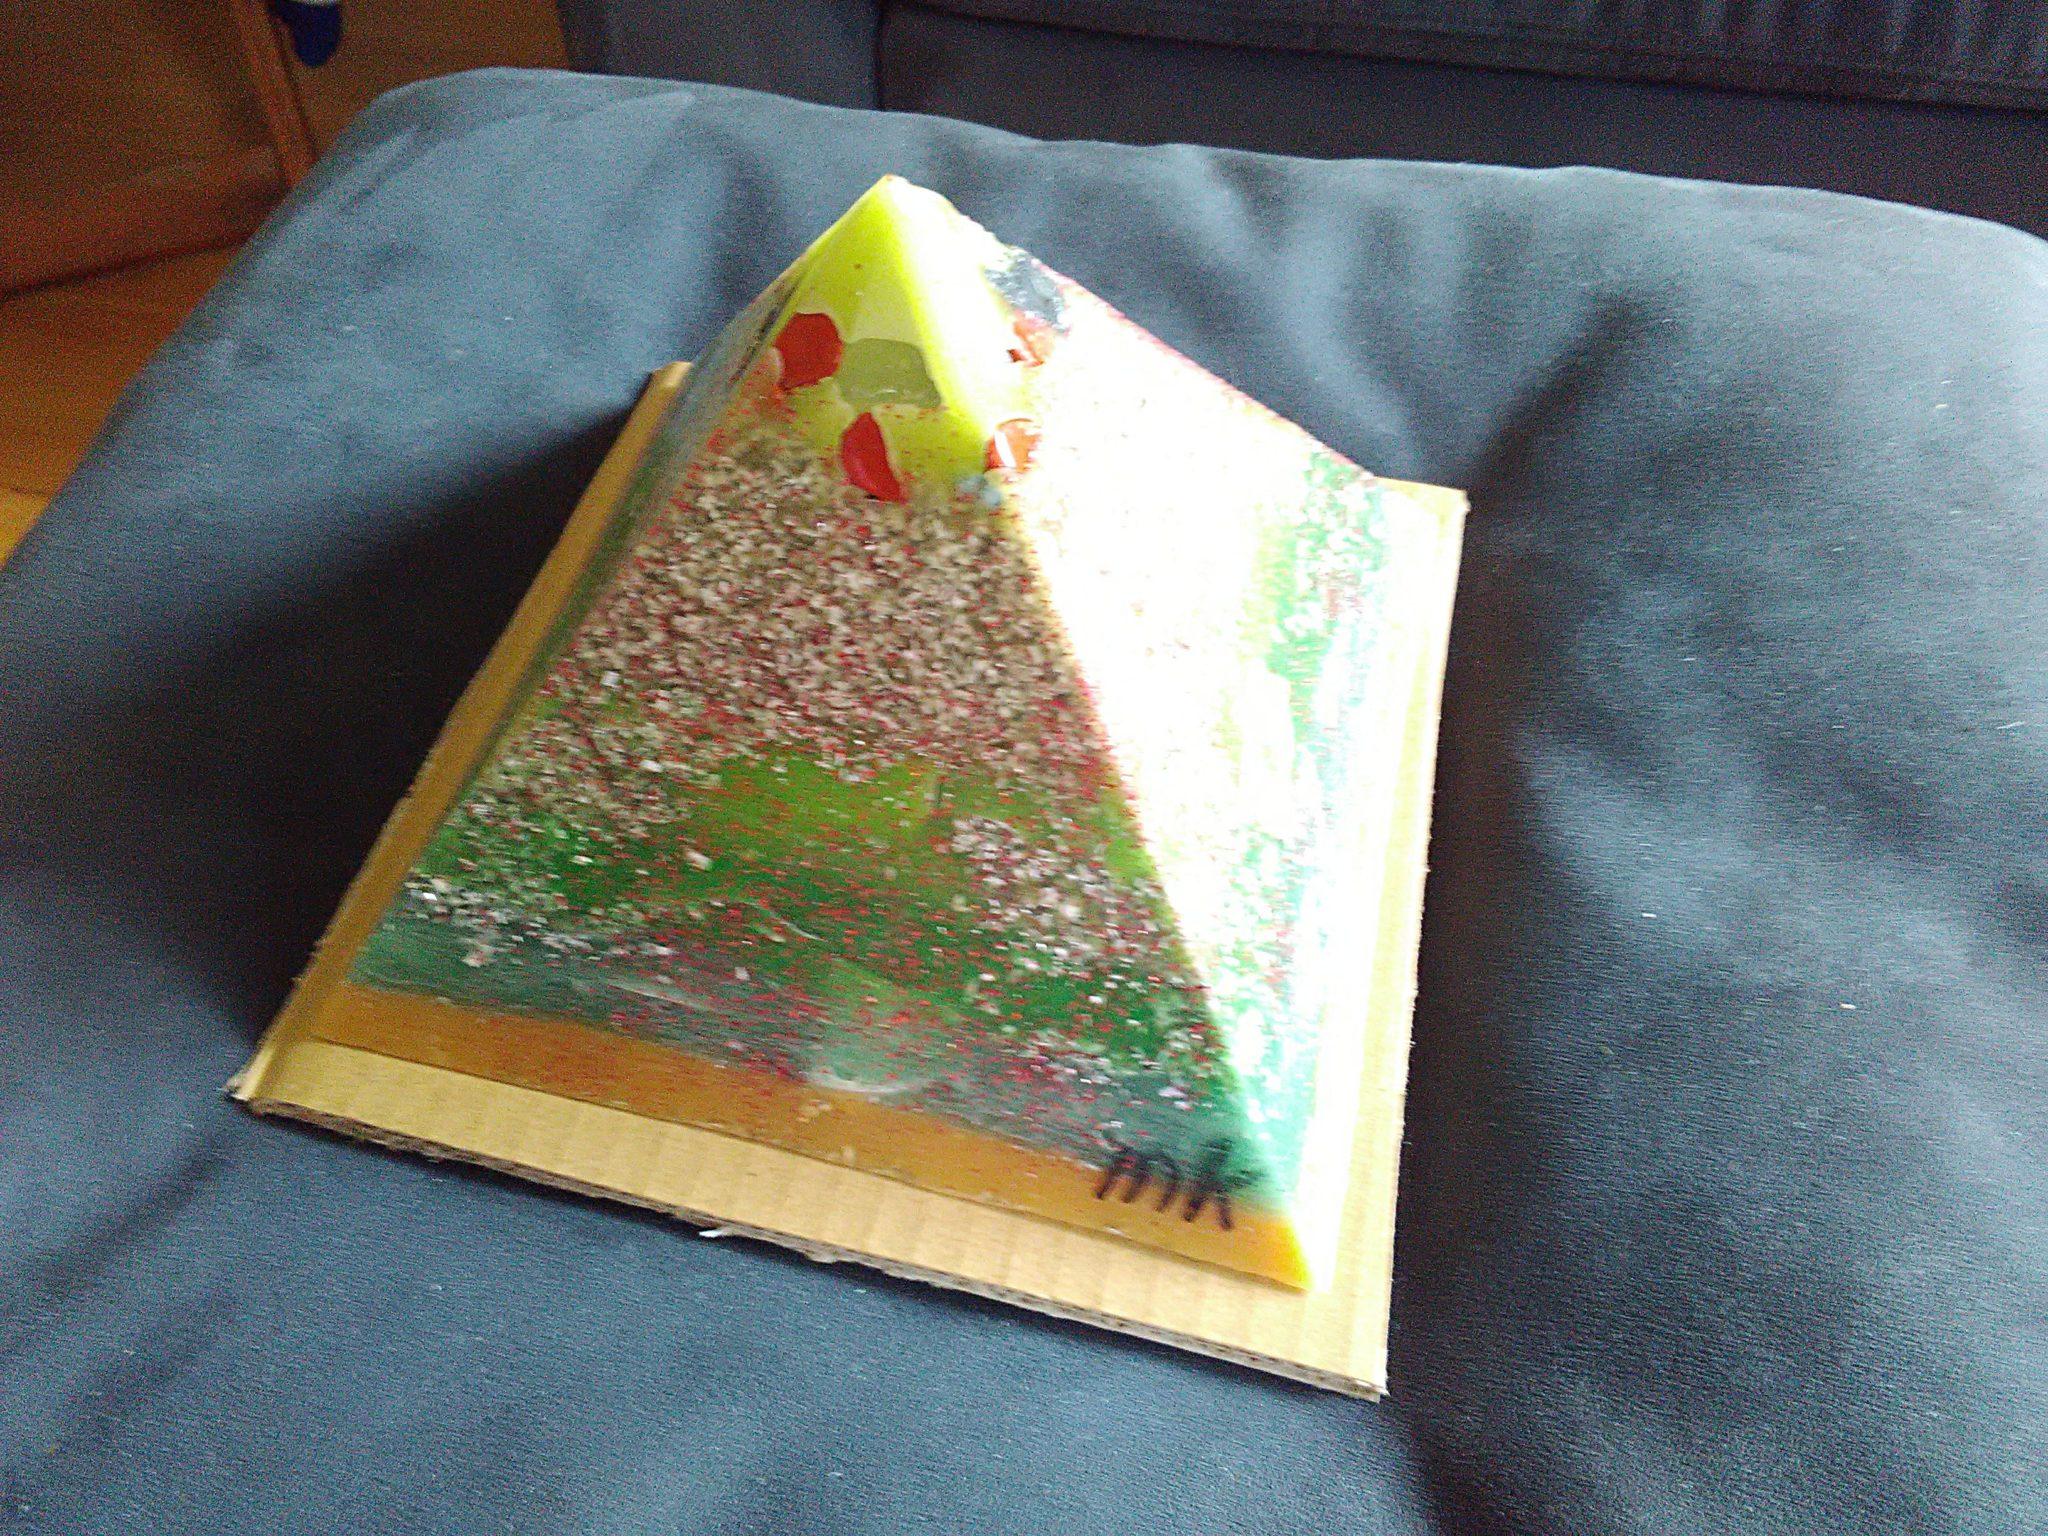 Liverpool 17 cm pyramid orgonite, bergkristall, shungite, tourmalijn, bijenwas en metalen.